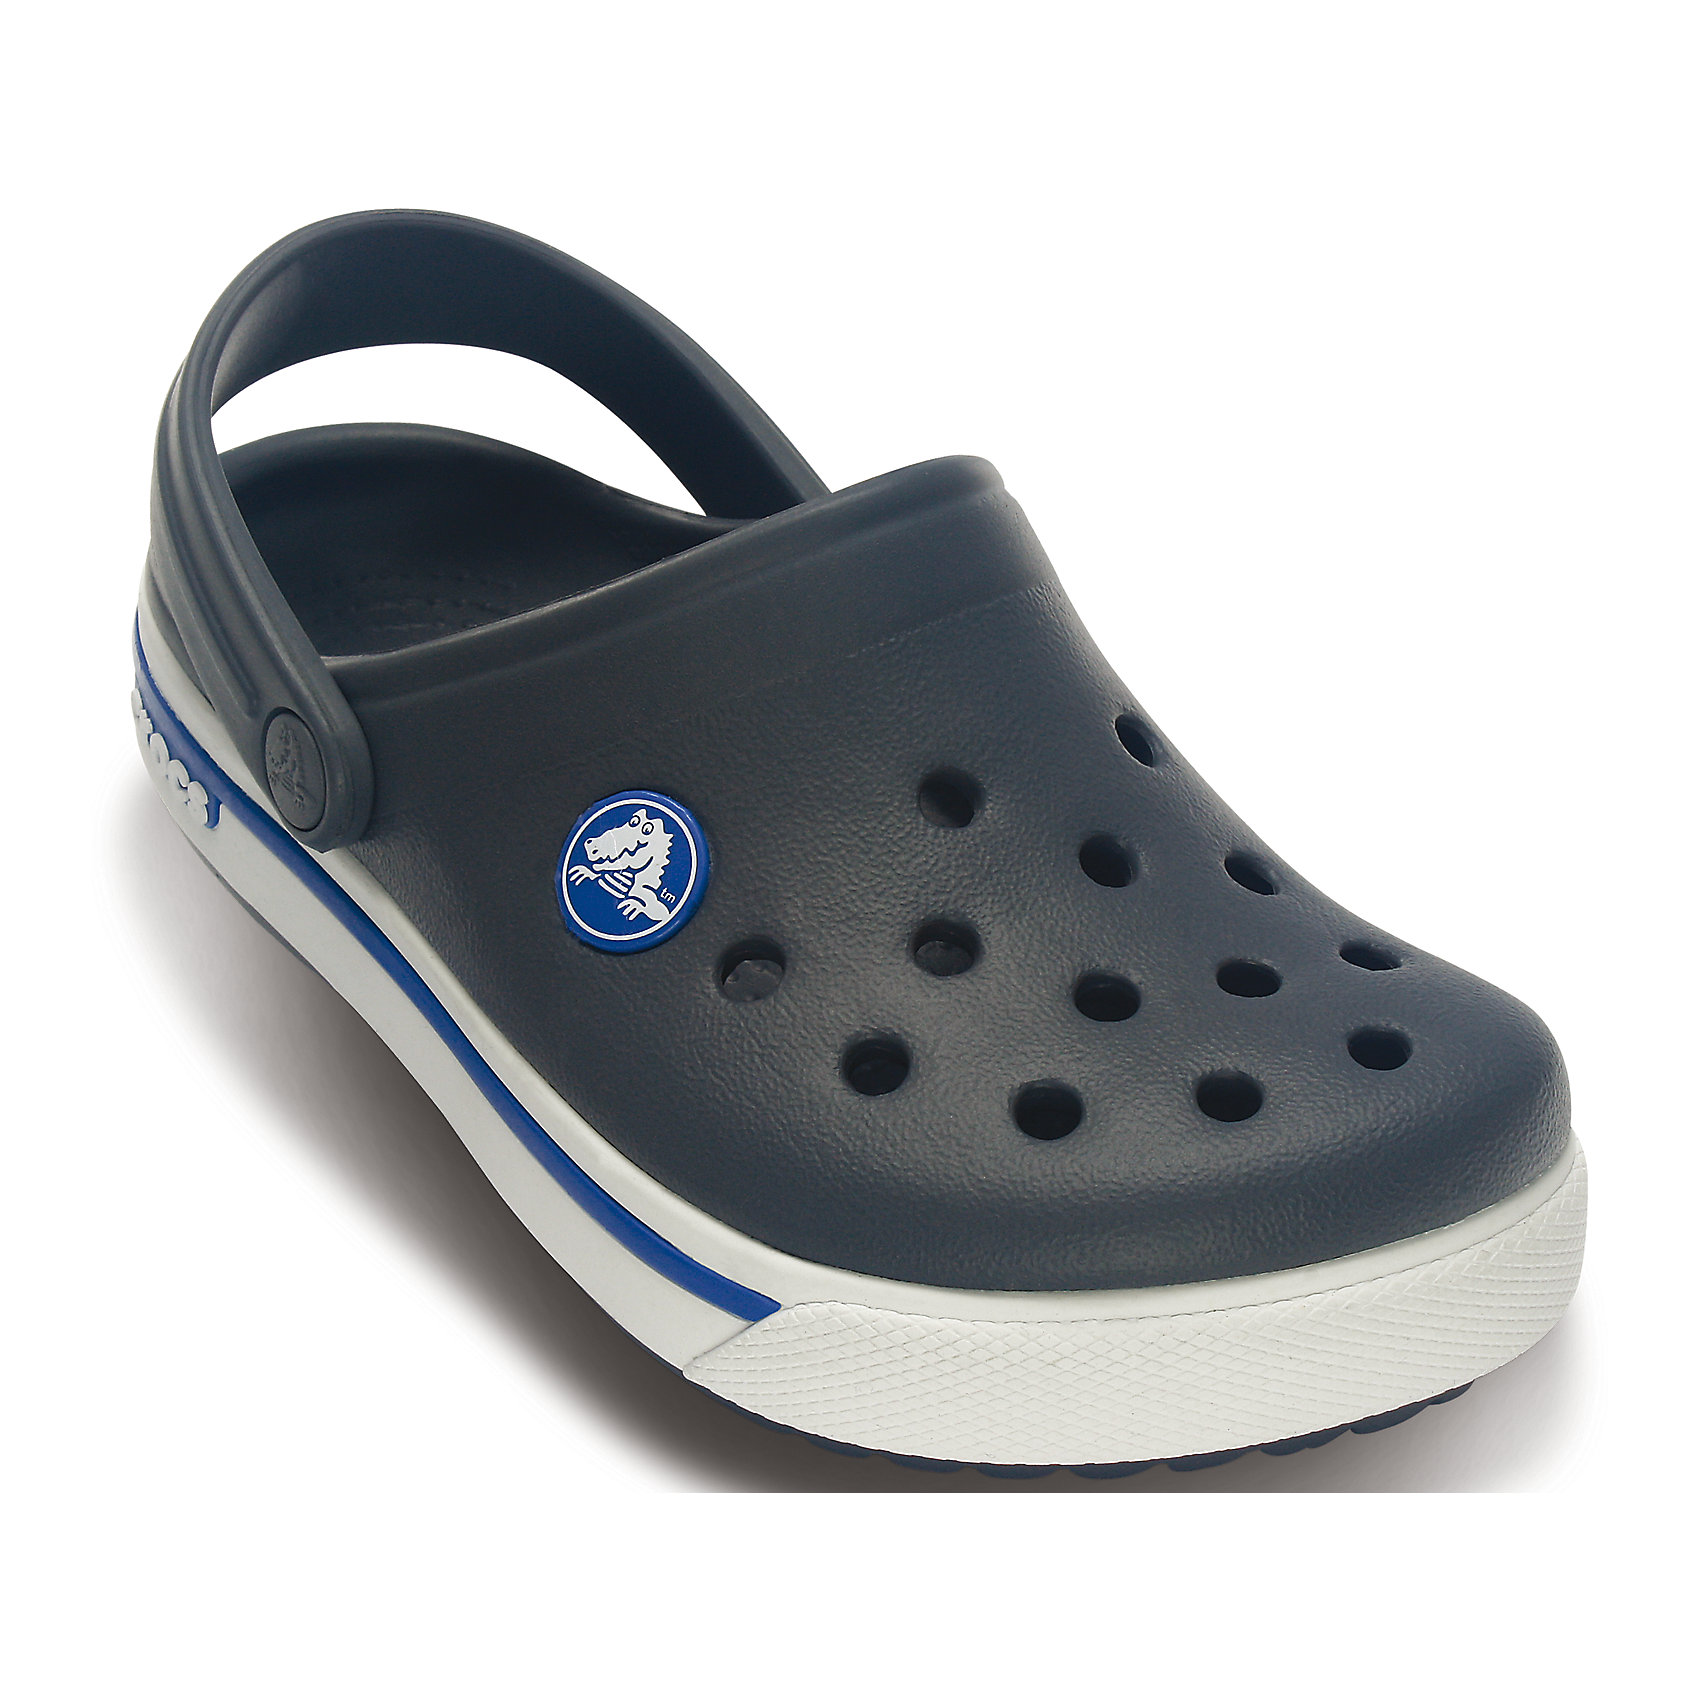 crocs Сабо Crocband II.5 Clog kids для мальчика Crocs